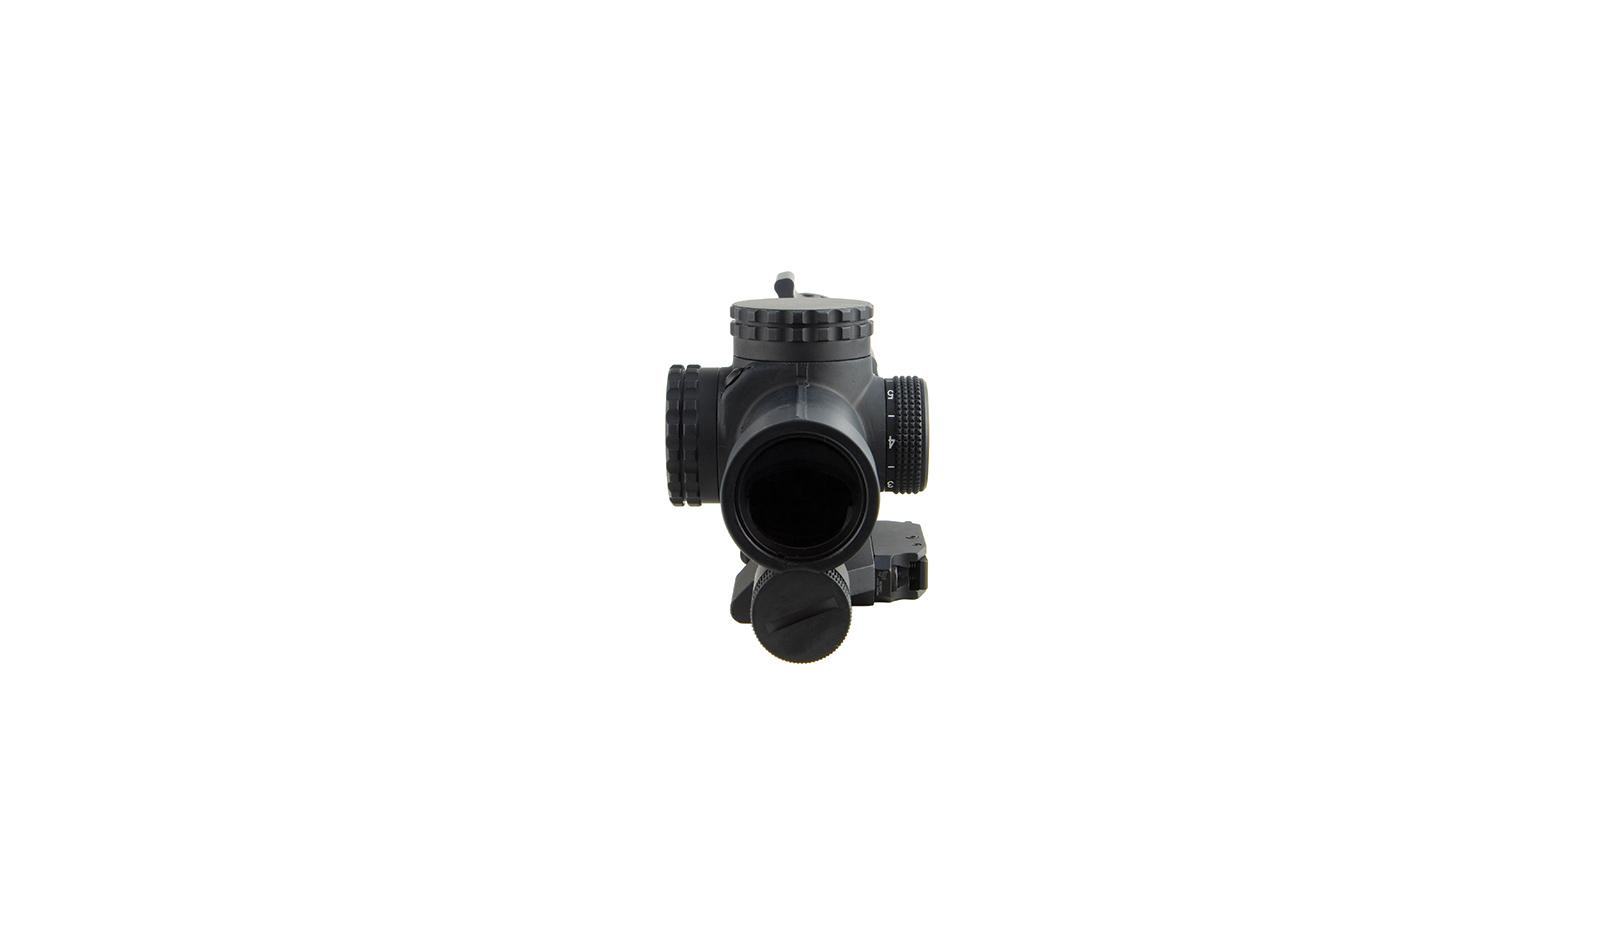 VC16-C-1600048 angle 8